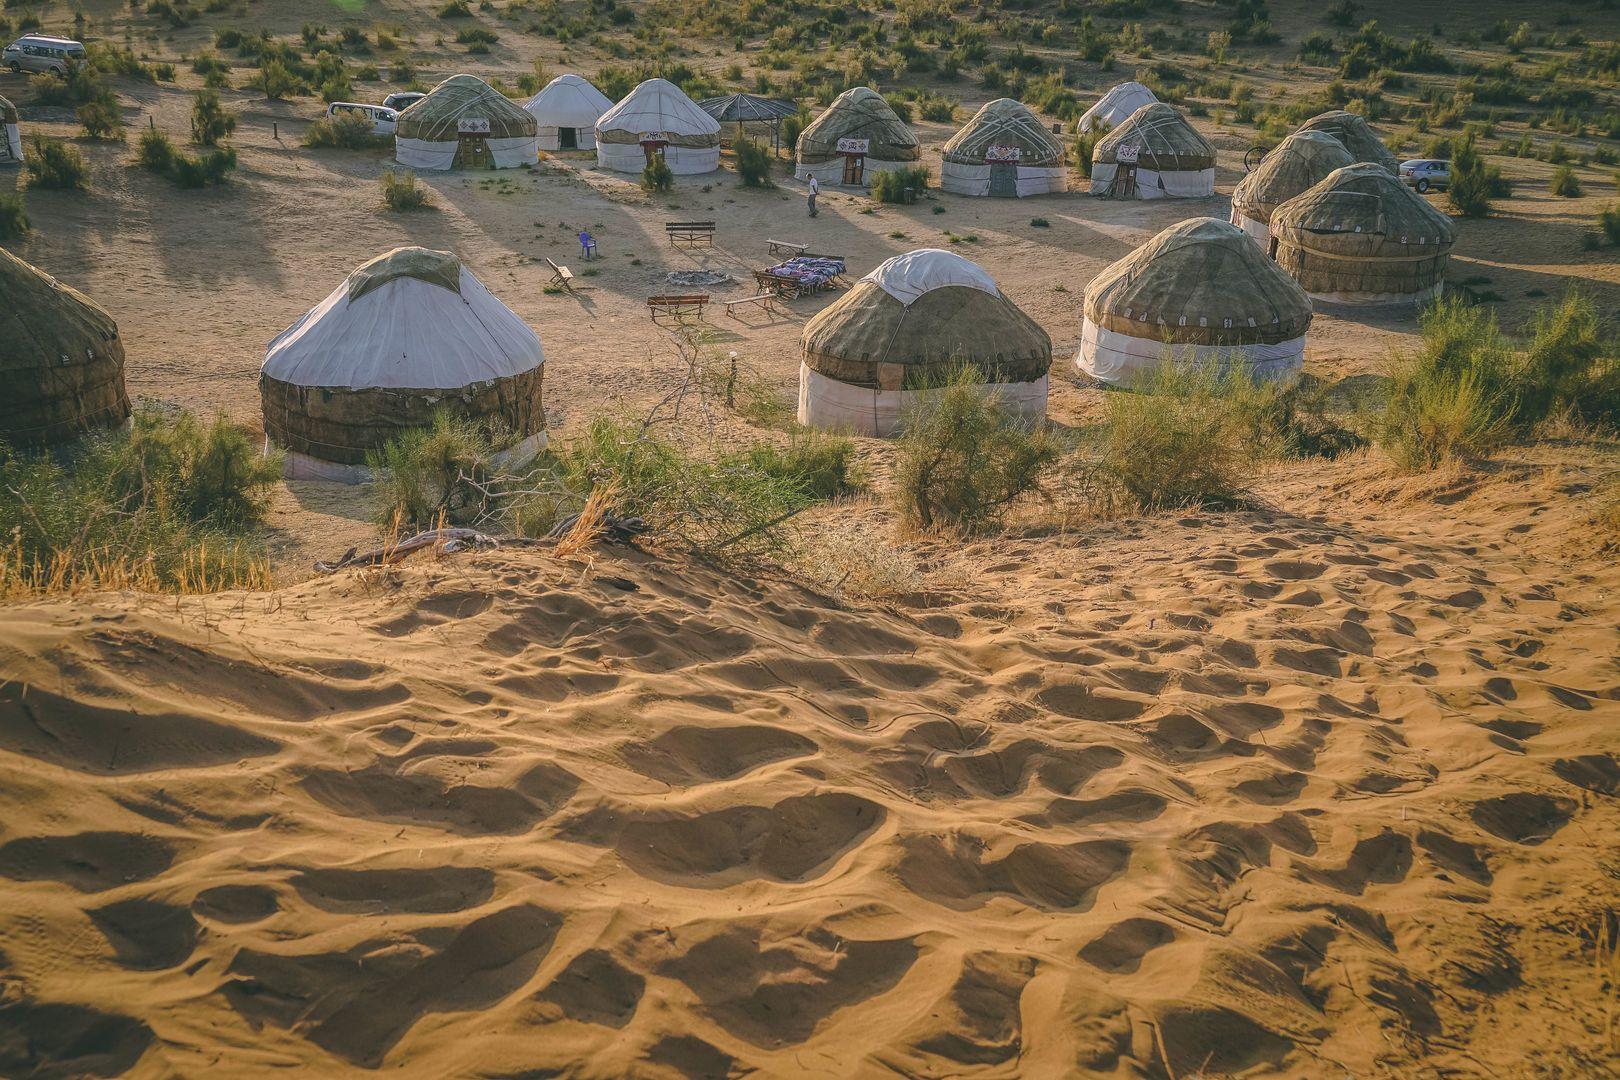 Uzbekistan desert nature